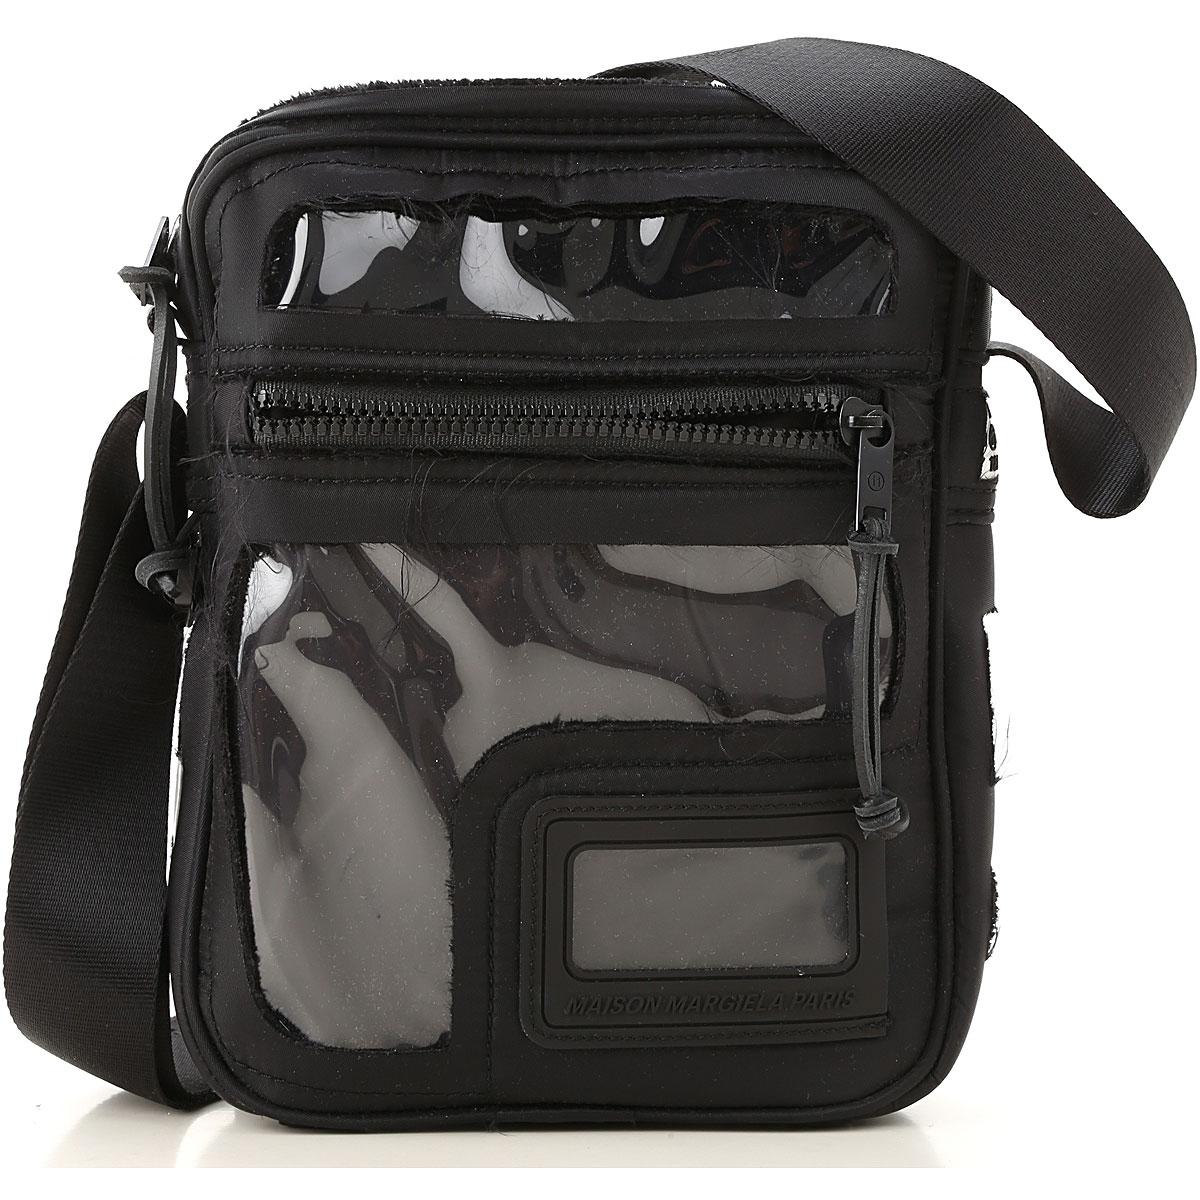 Maison Martin Margiela Briefcases, Black, PVC, 2019